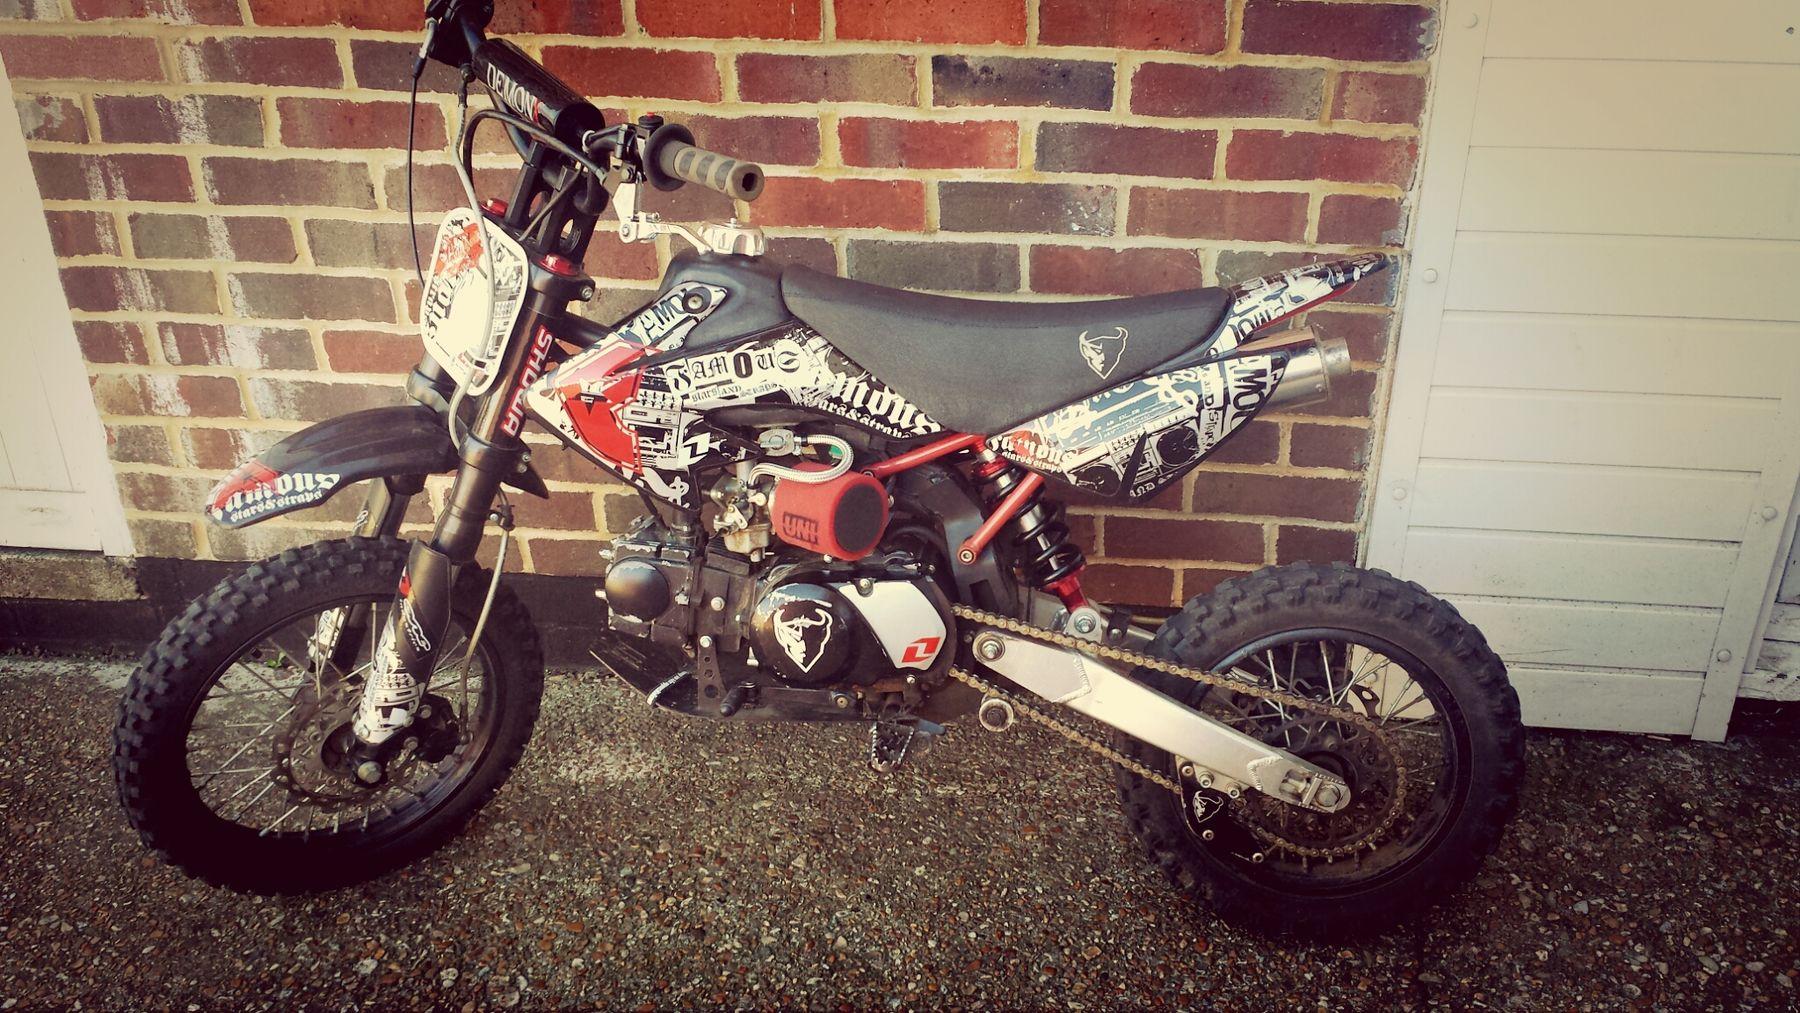 Pitbike 110cc Demon X pitbike ready